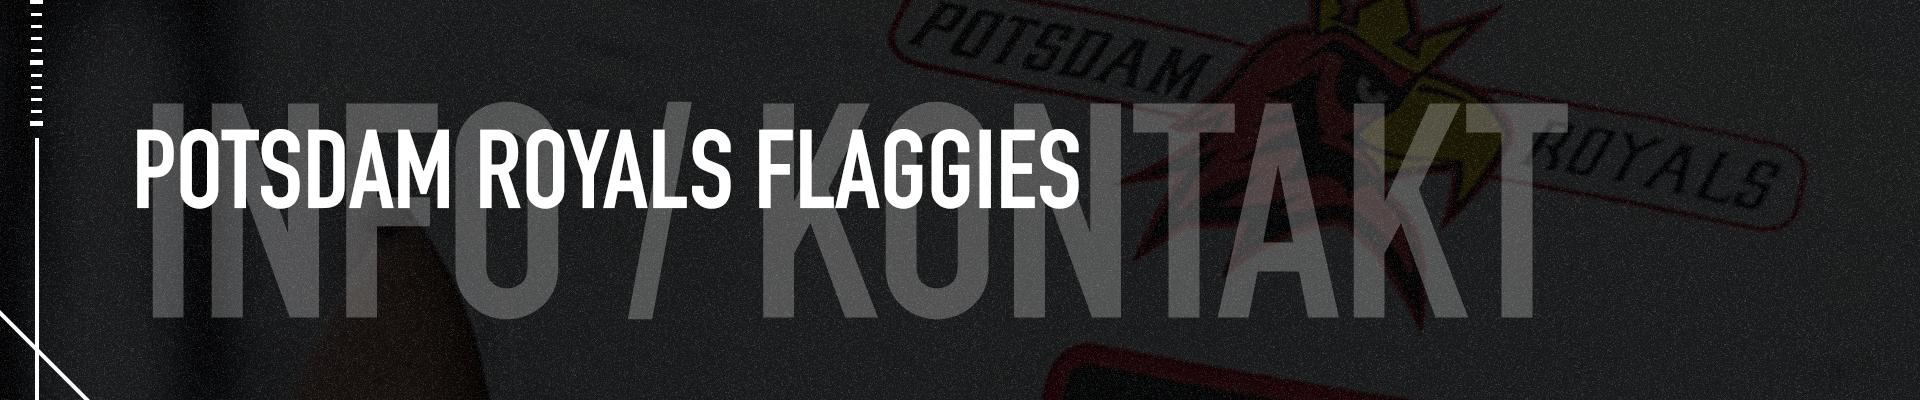 Flaggie-Info